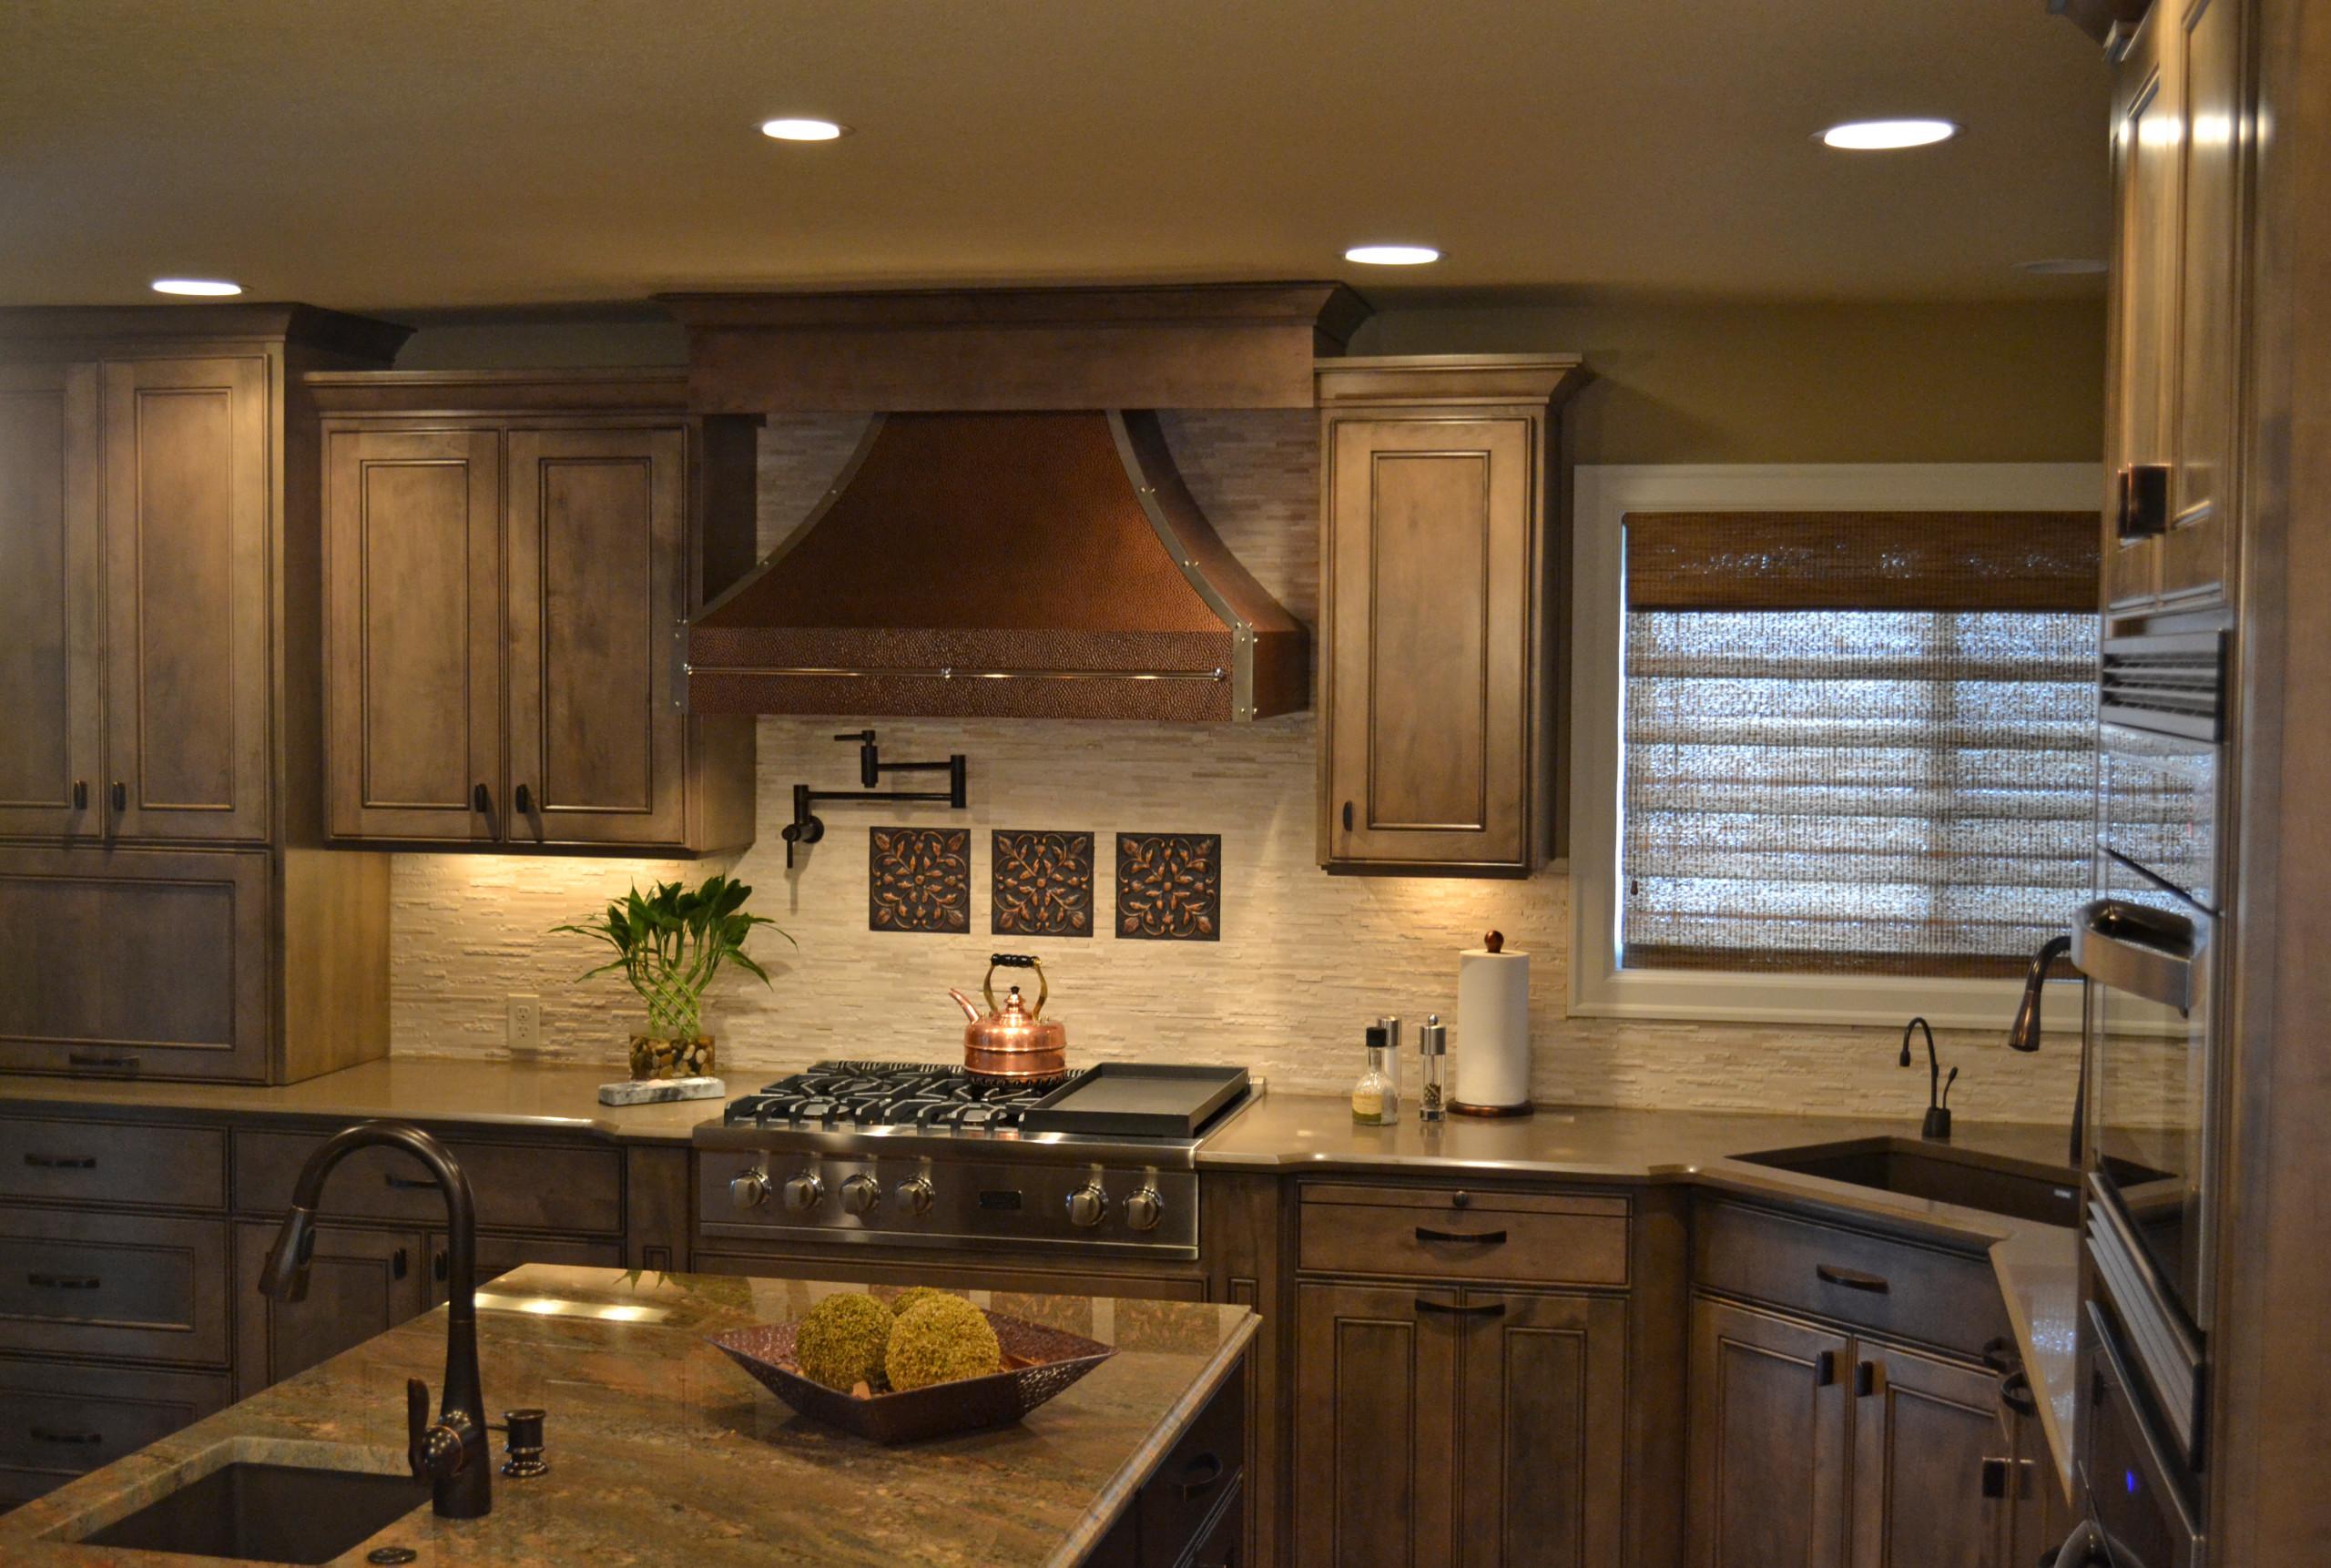 Brock Kitchen remodel